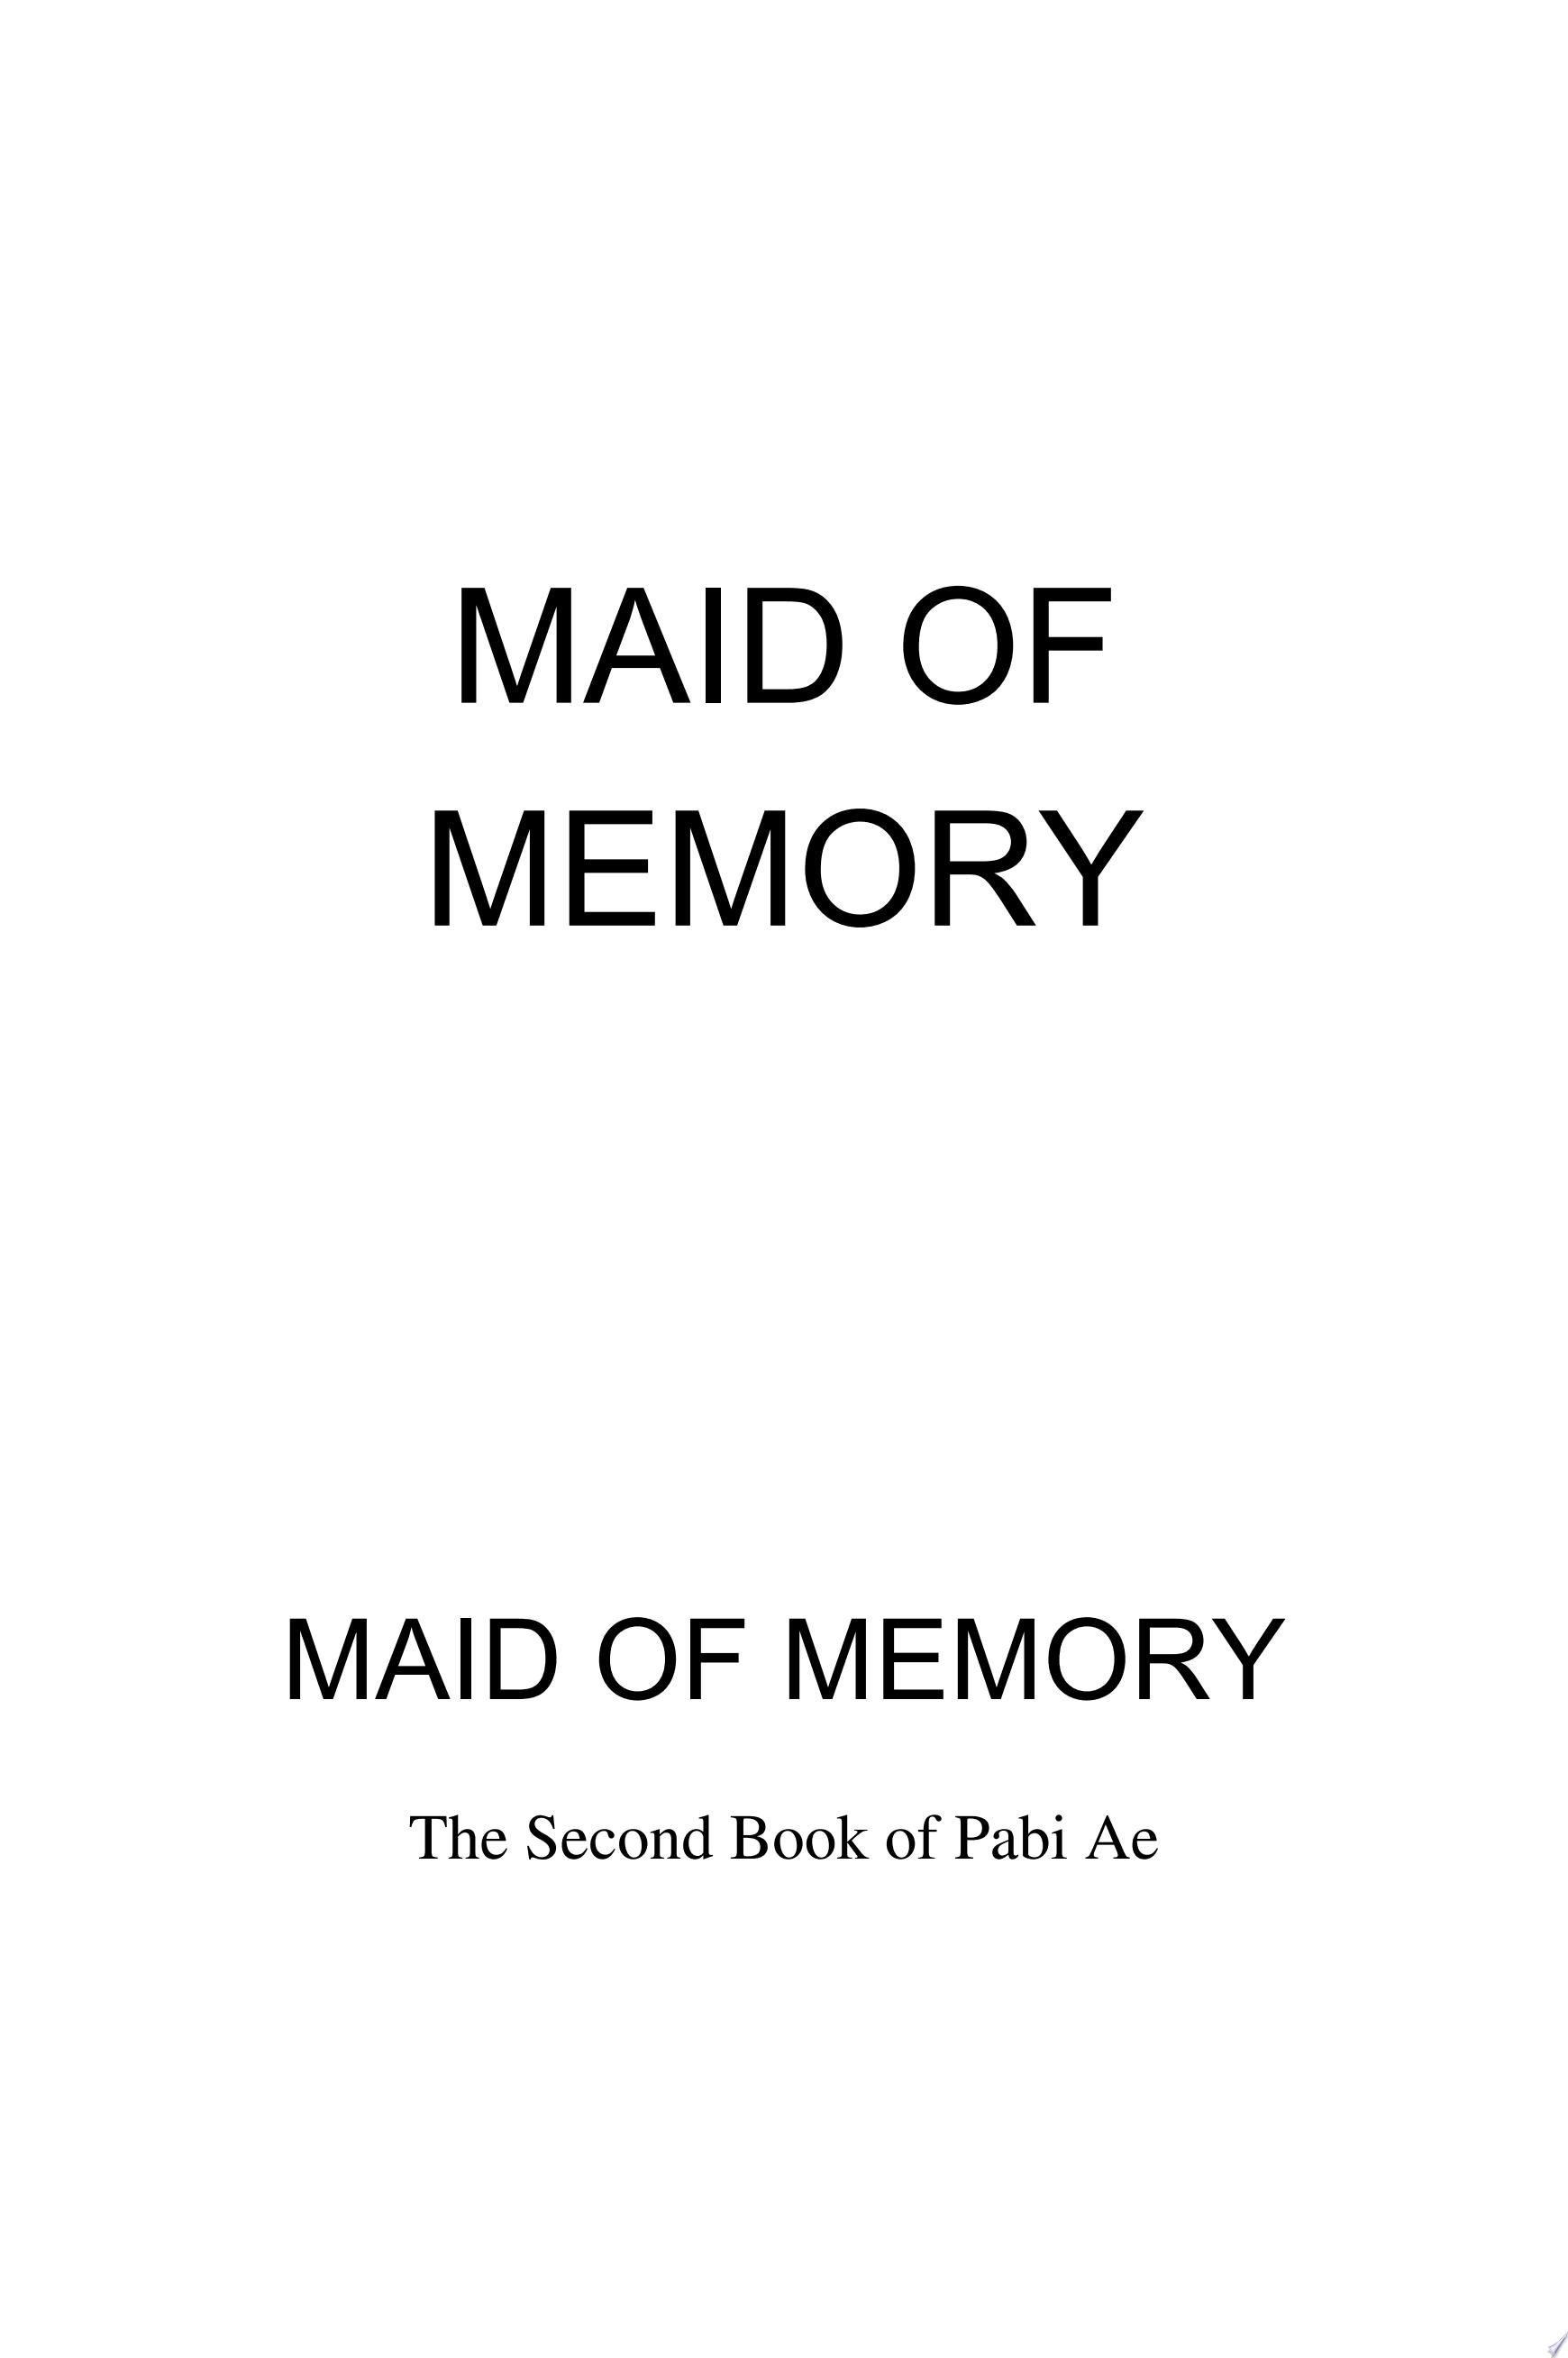 Maid of Memory